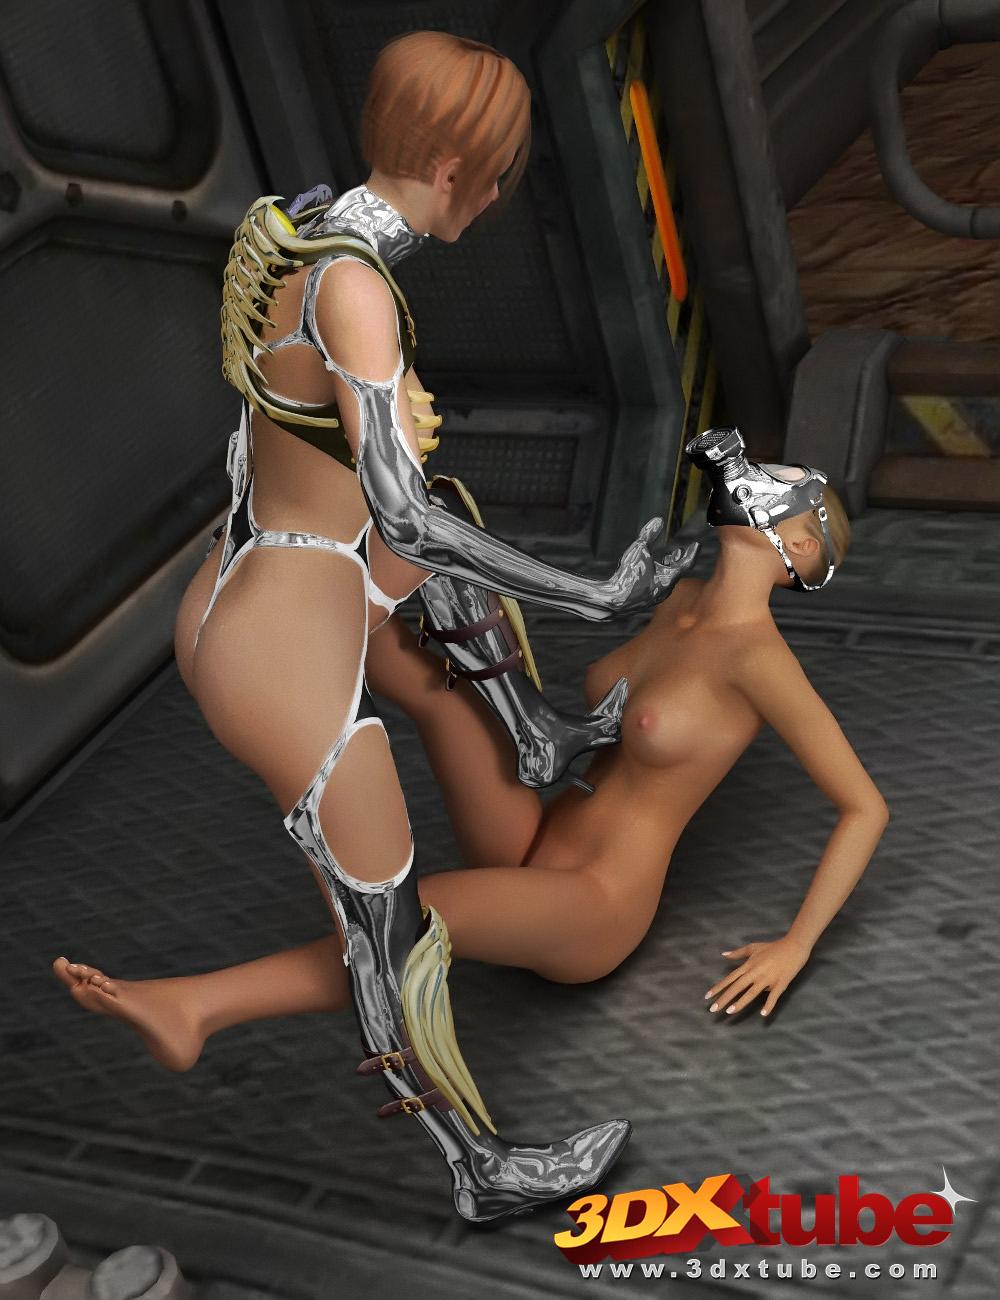 Free scifi porn adult photos